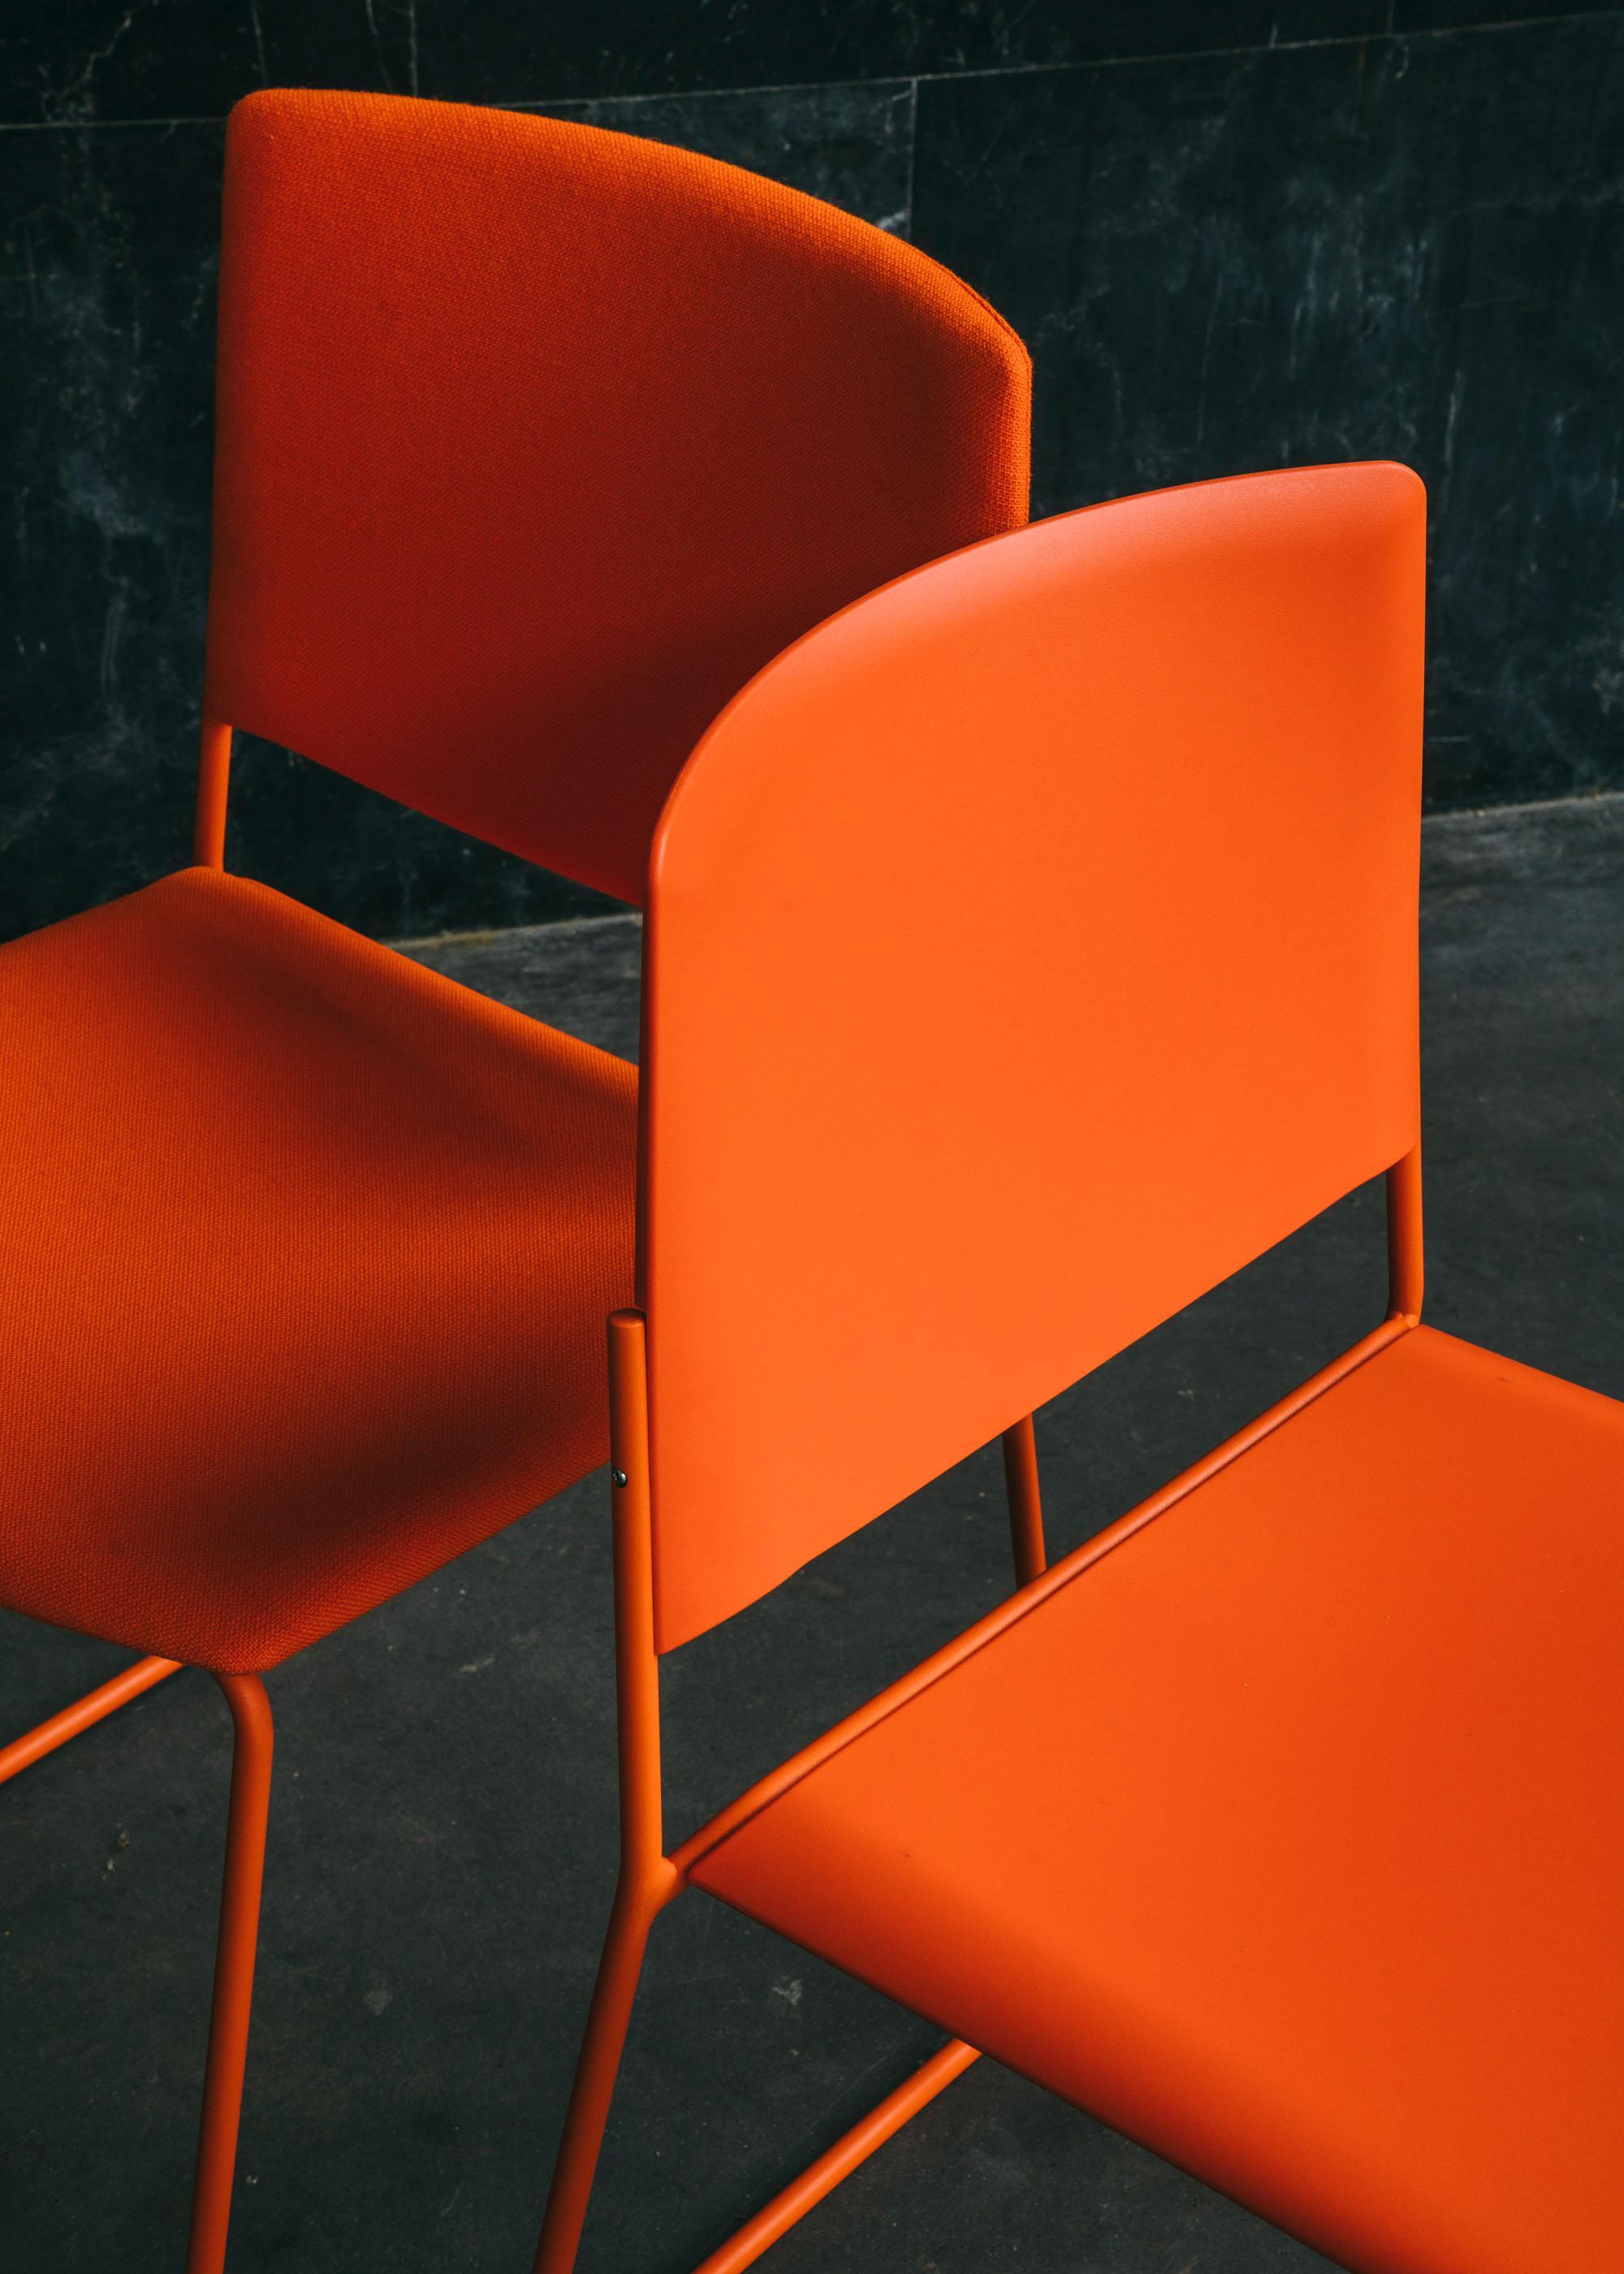 #furniture #enea #design #clase #basque #chairs #stilllife #orange